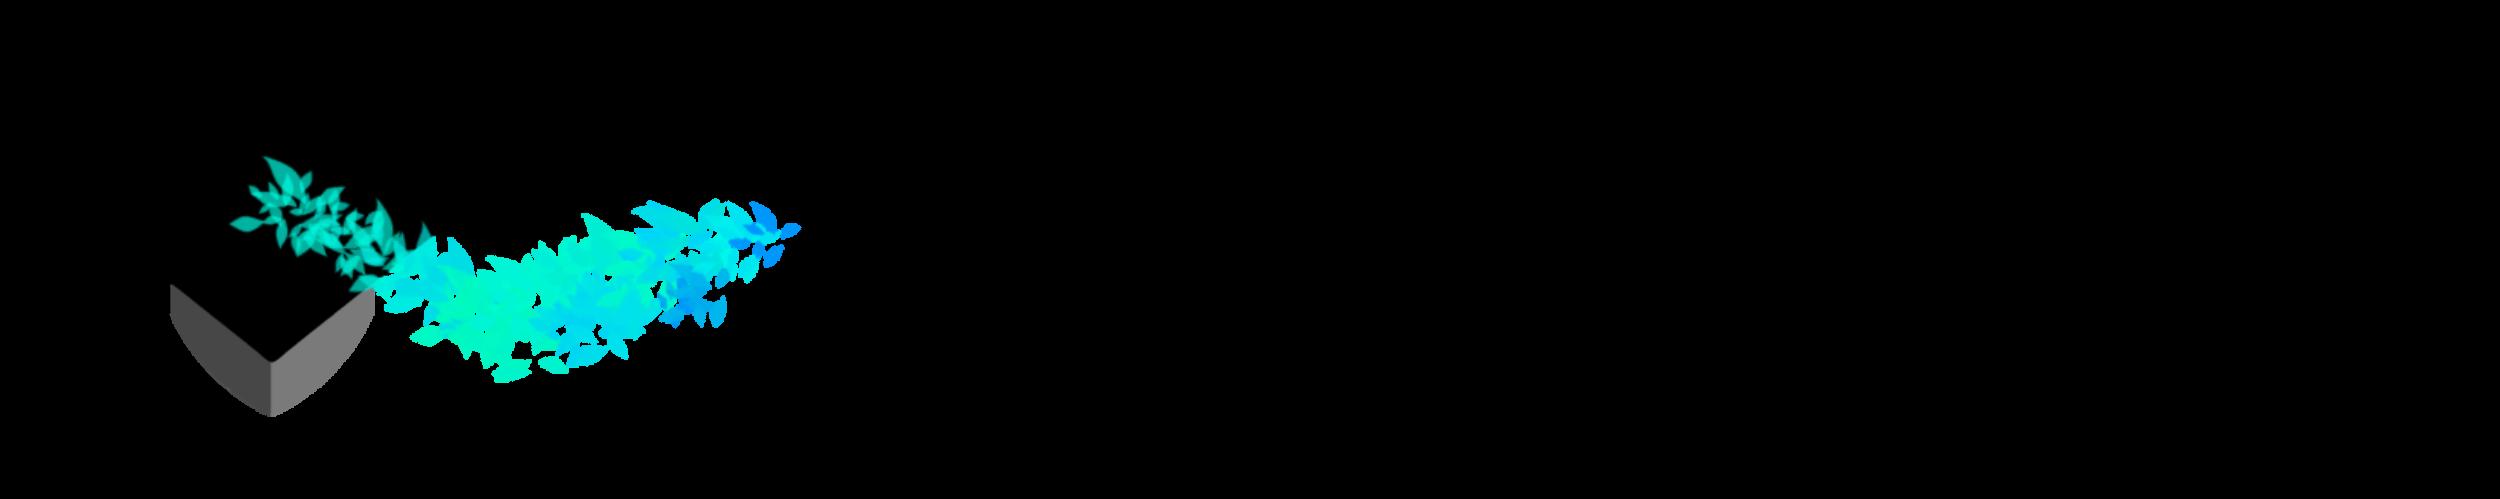 MUMEI Academy 2021